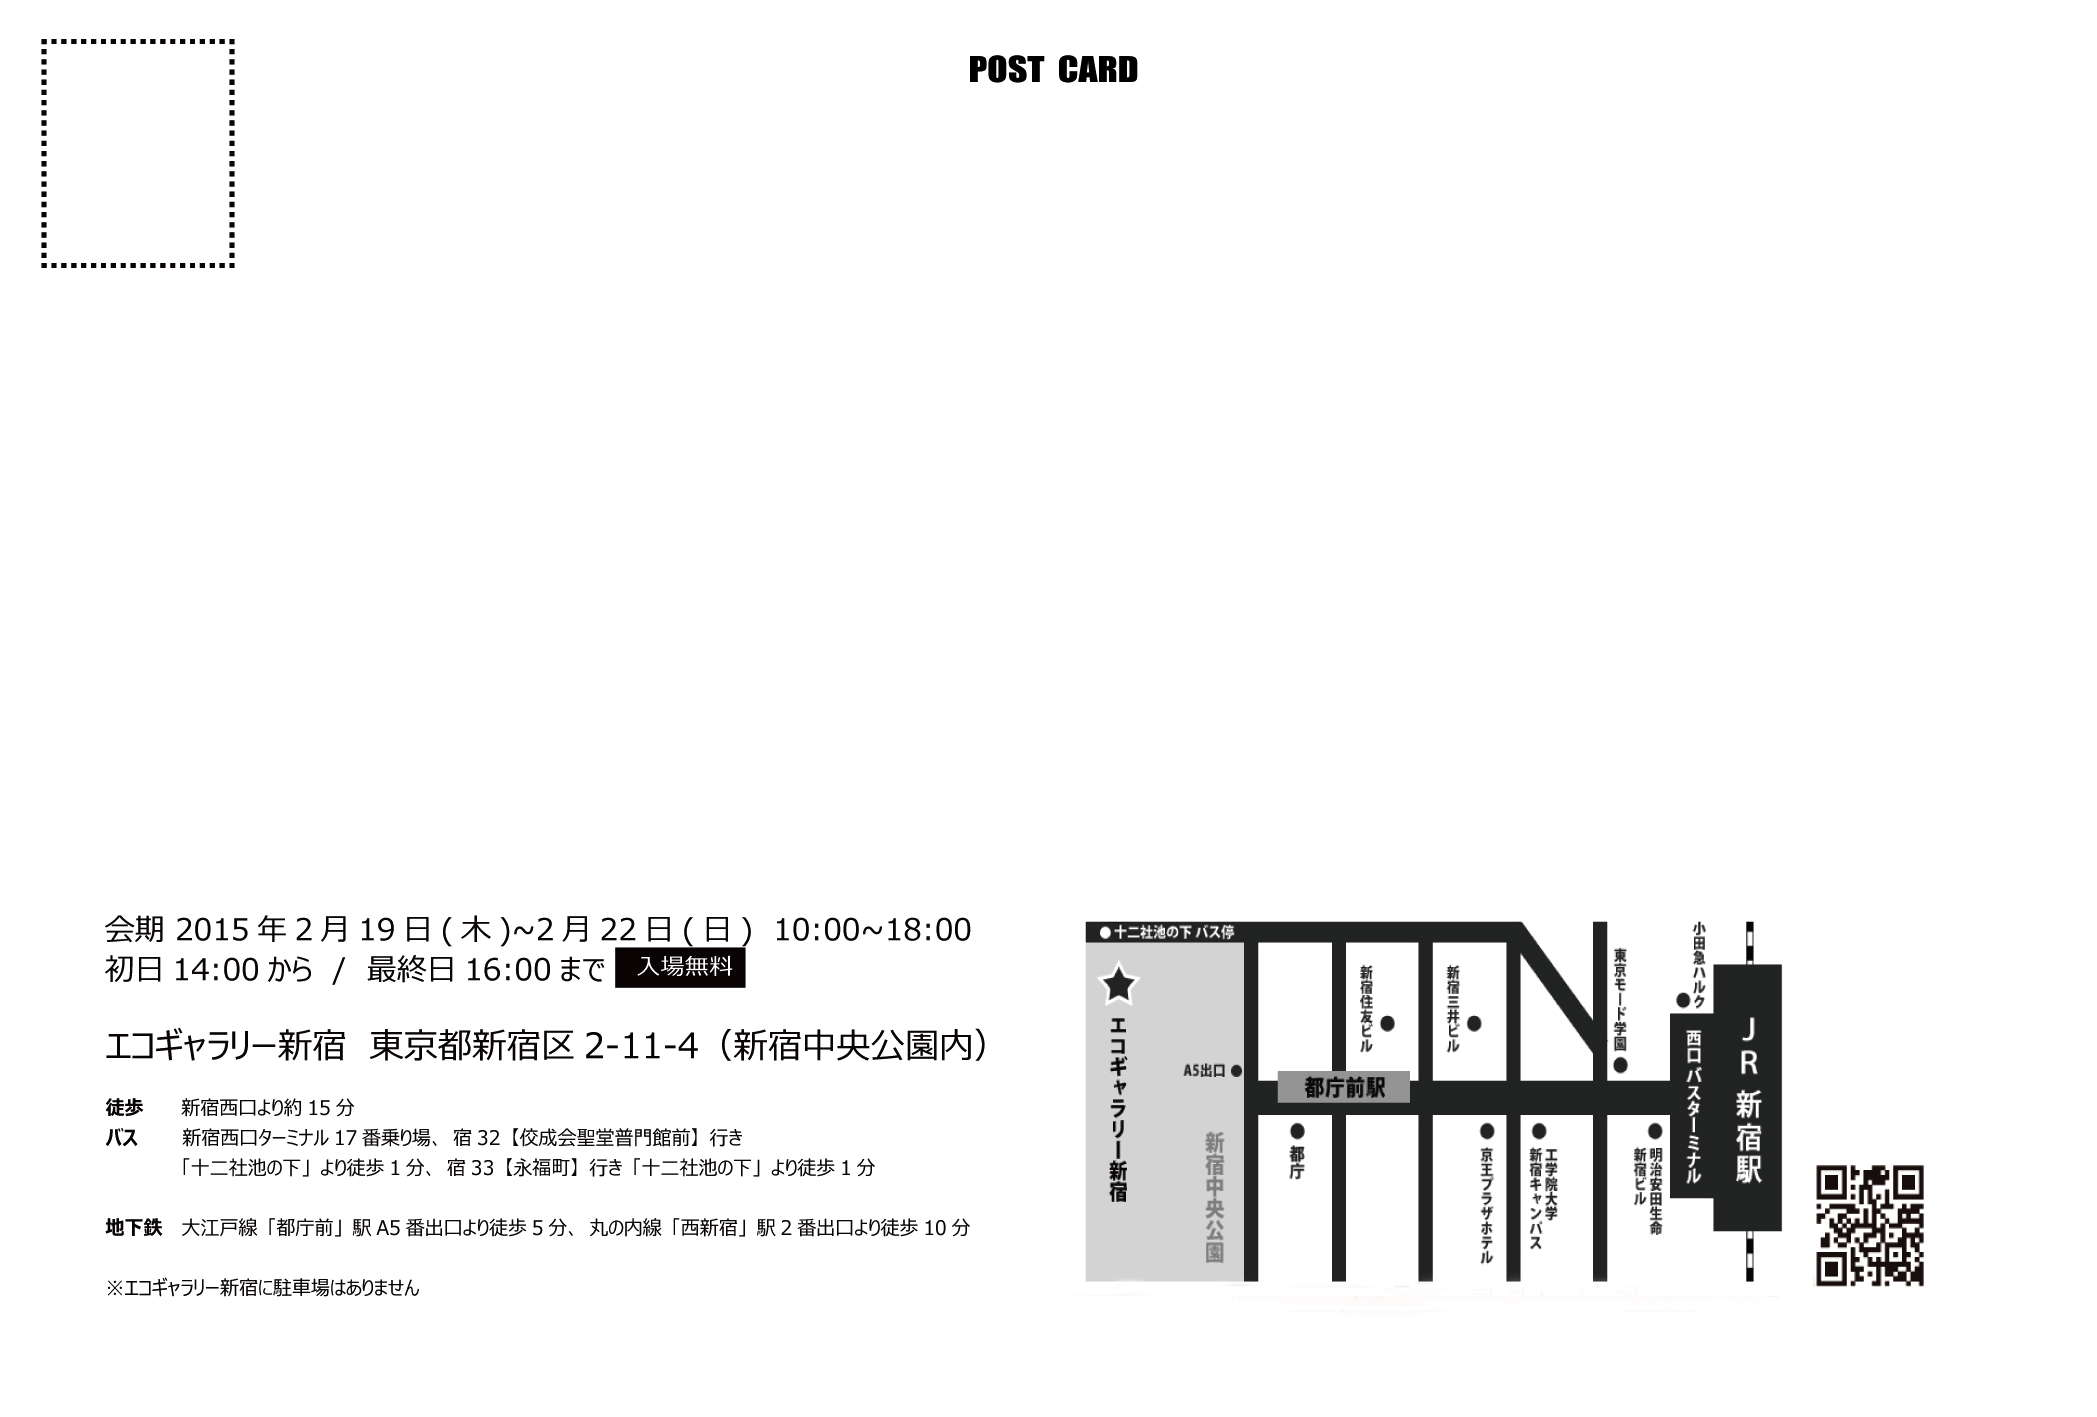 DM-mapb.jpg